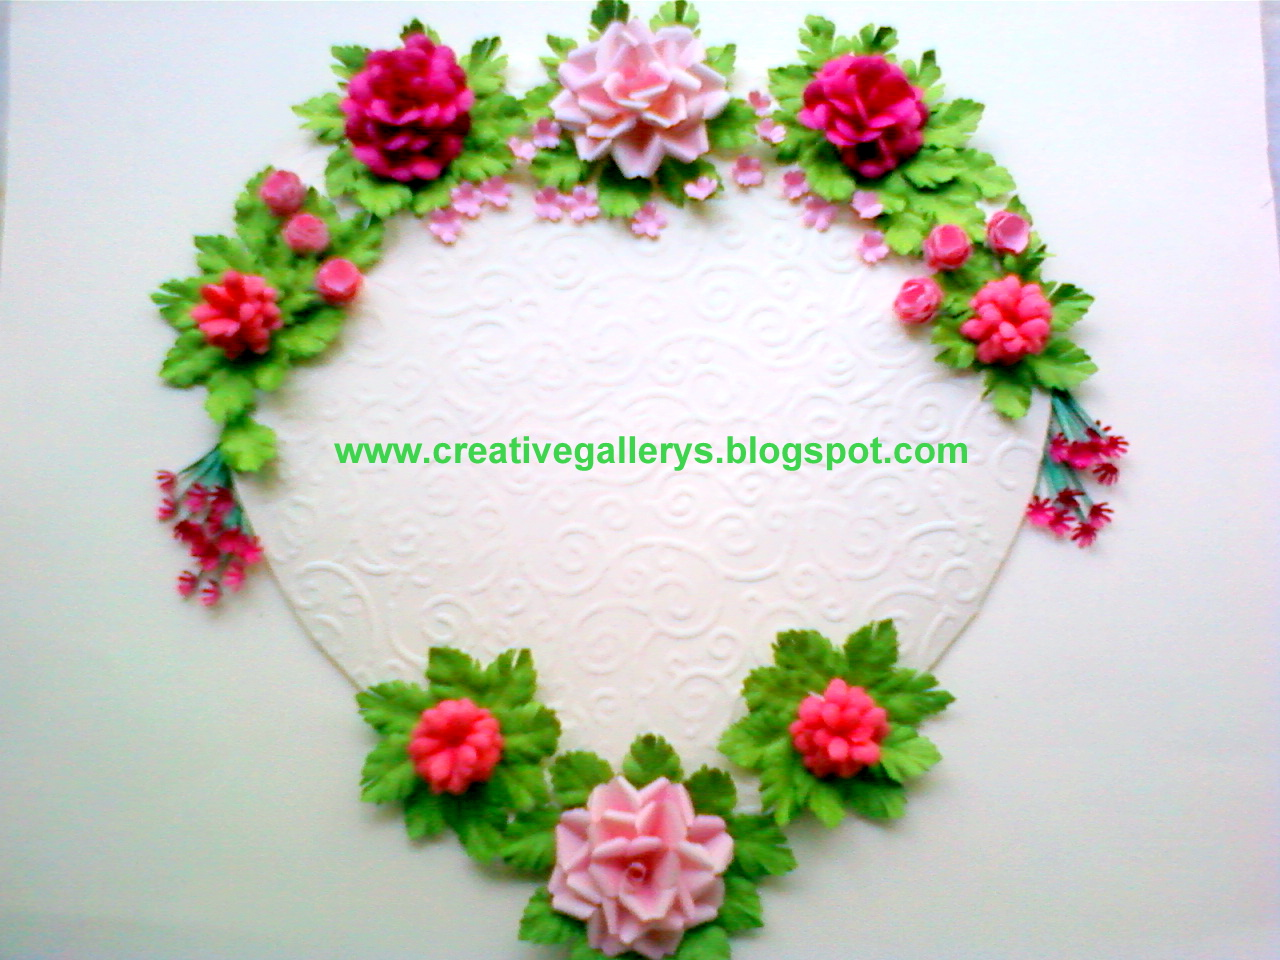 http://1.bp.blogspot.com/_aLtj4M6kEuU/THEPKwH-HdI/AAAAAAAAALM/8KmF8jUWQZg/s1600/punch+craft+3.jpg